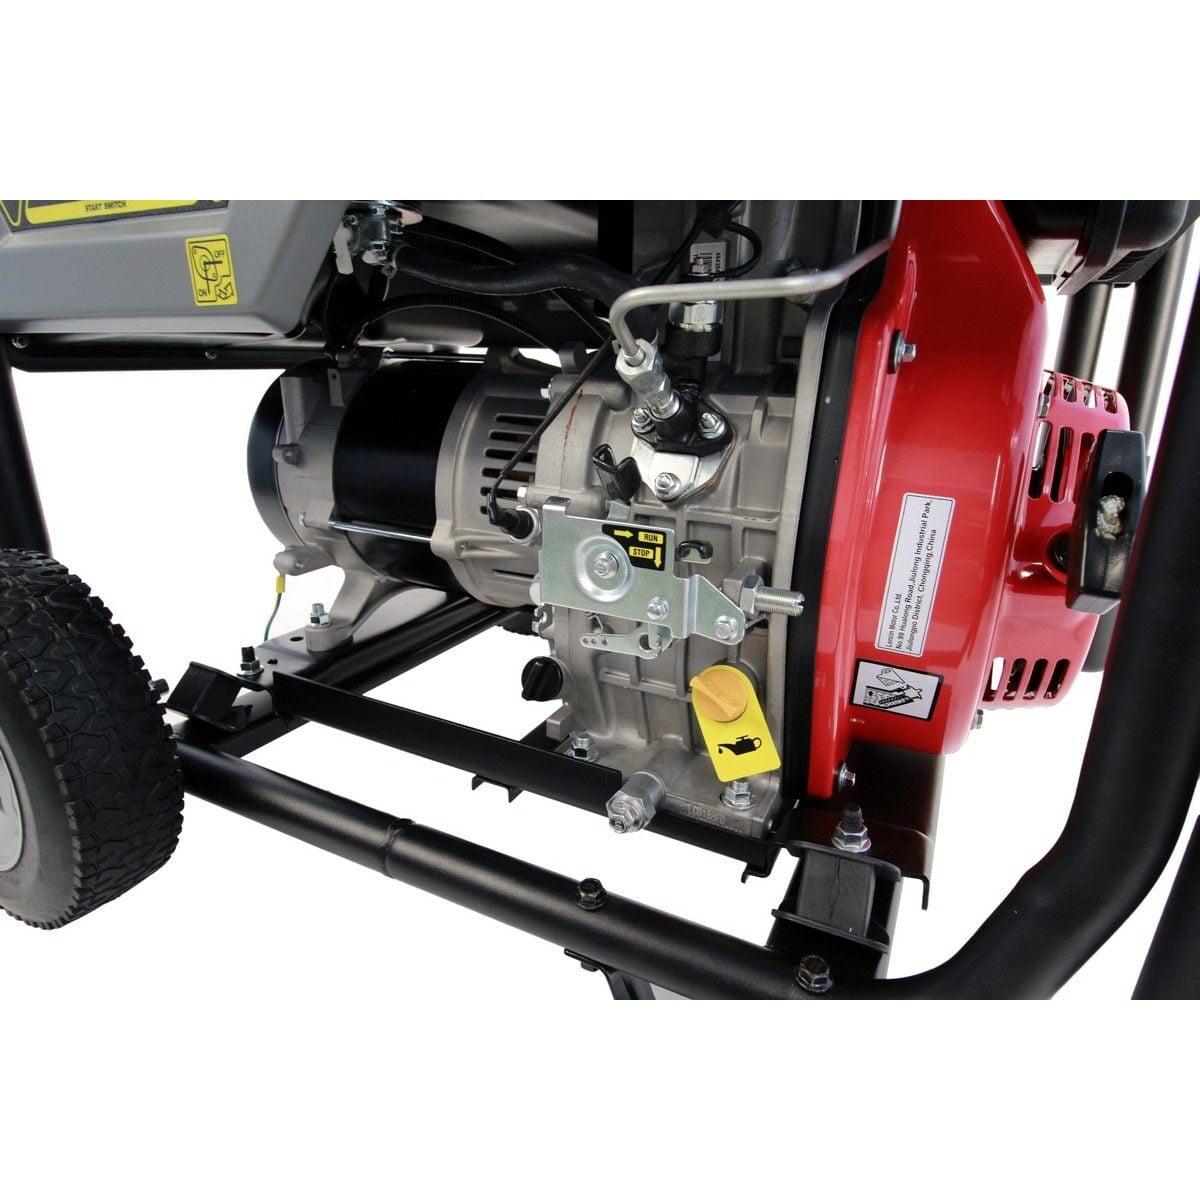 lcd7500d generator loncin 6 0kw 220v diesel o mac.ro 7